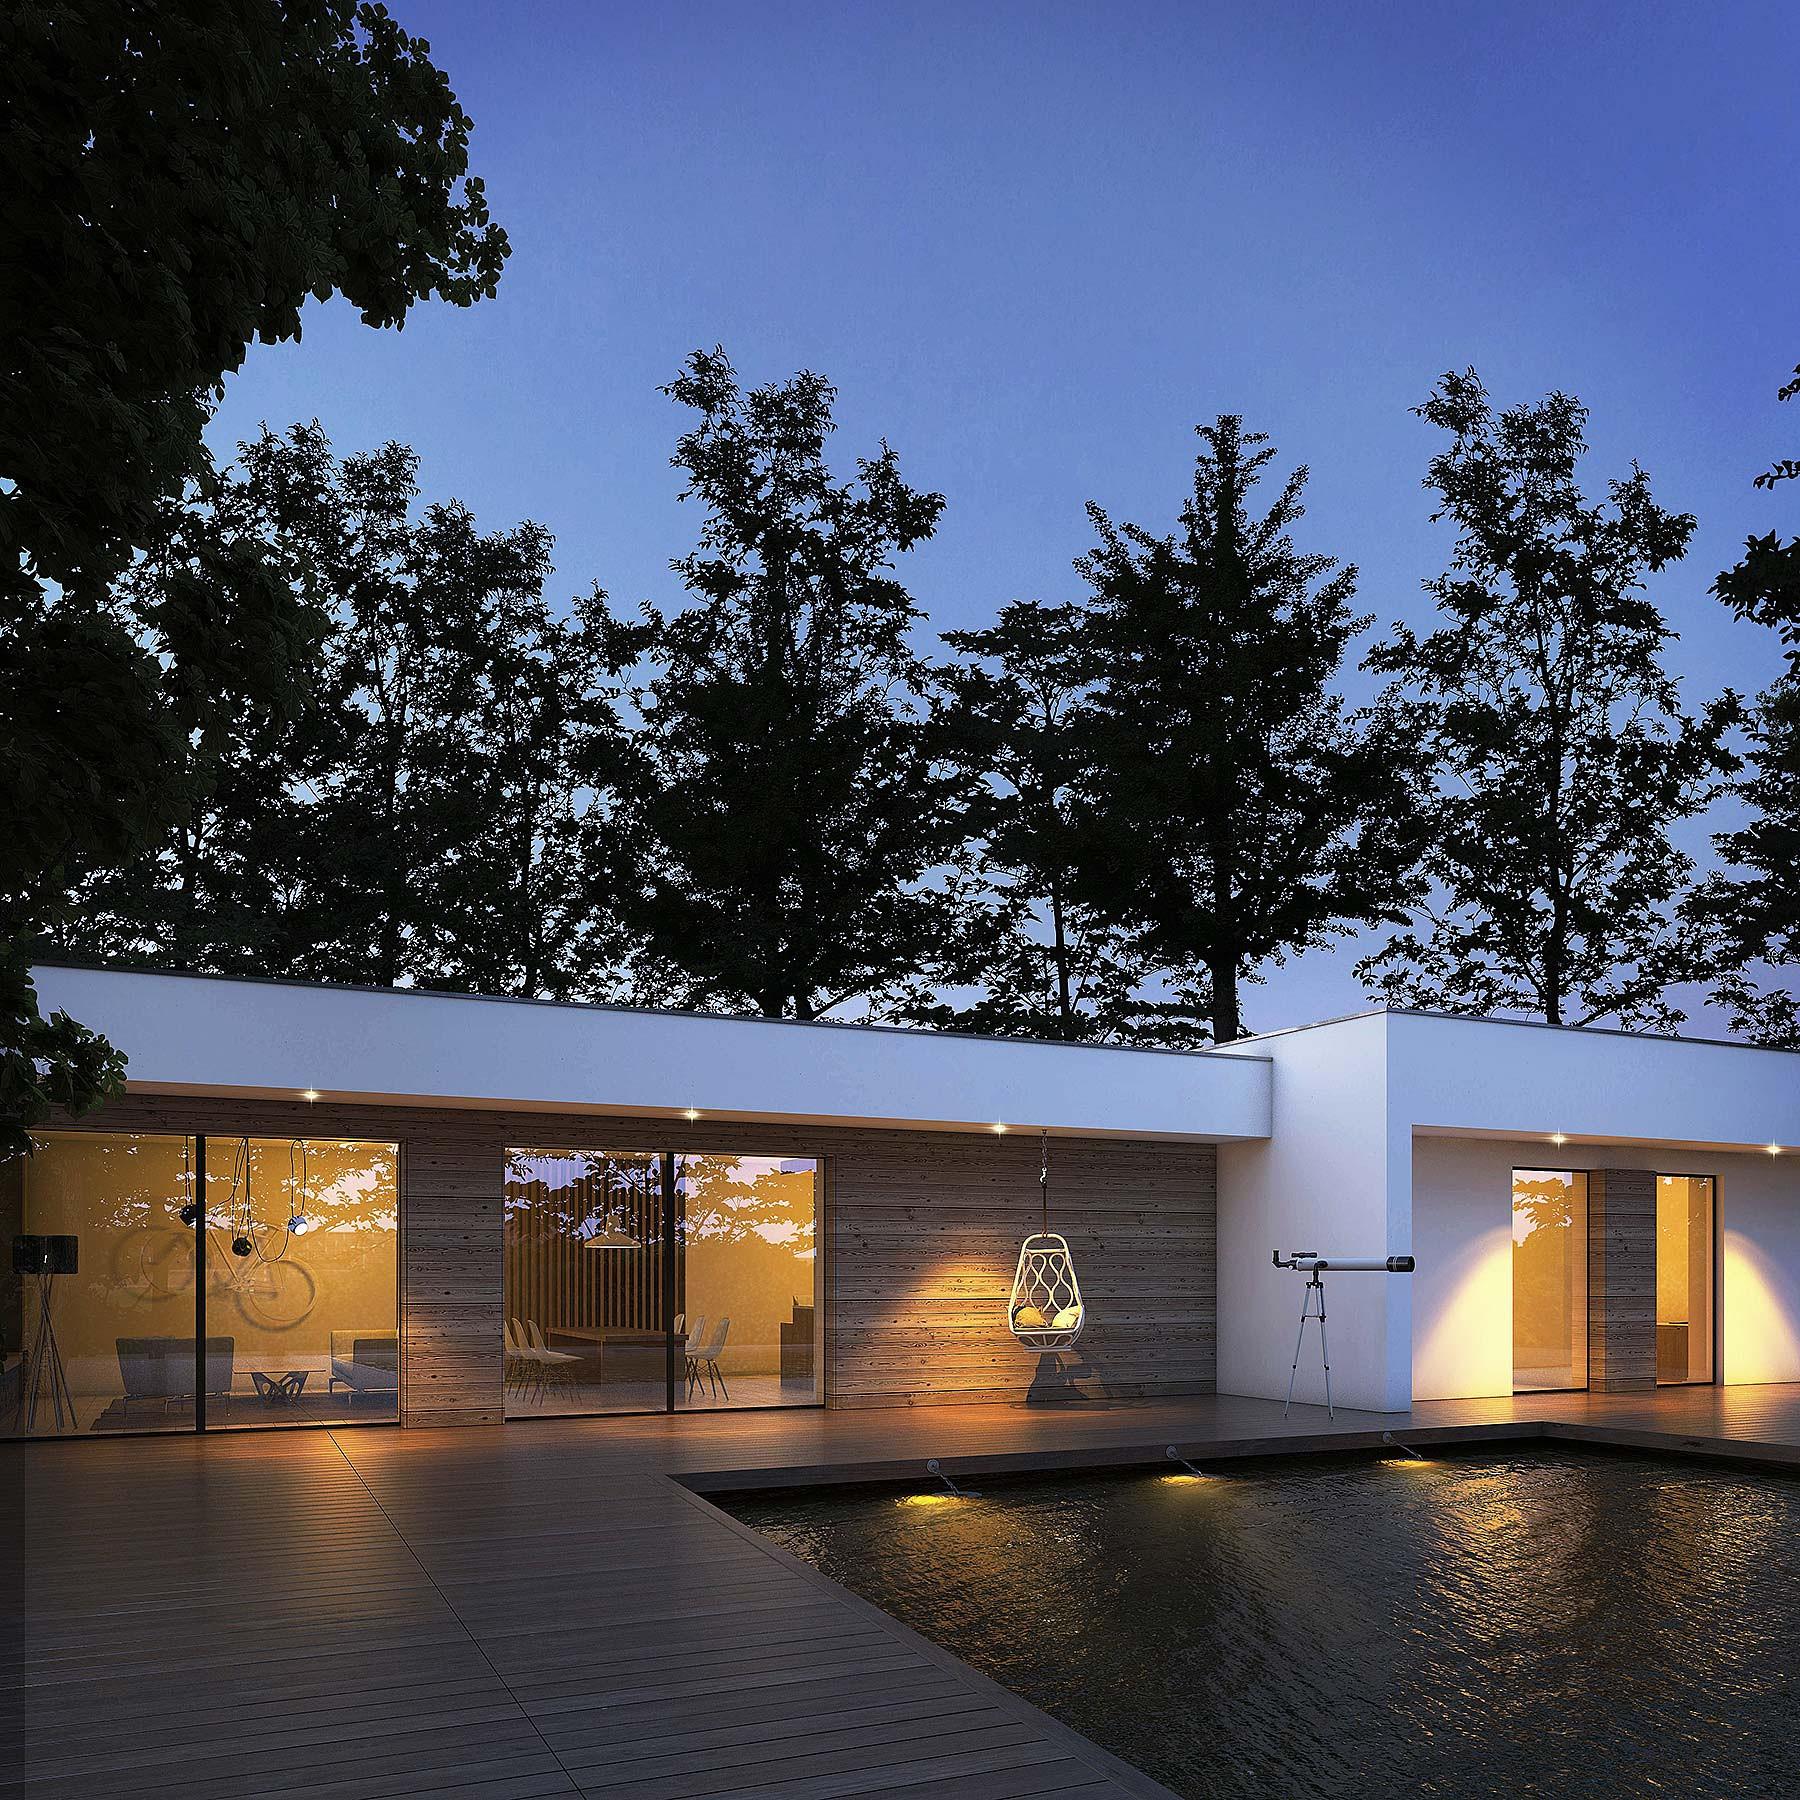 moderni_jednopodlazni_rodinny_dum_s_plochou_strechou_dream_homes_plavec_night